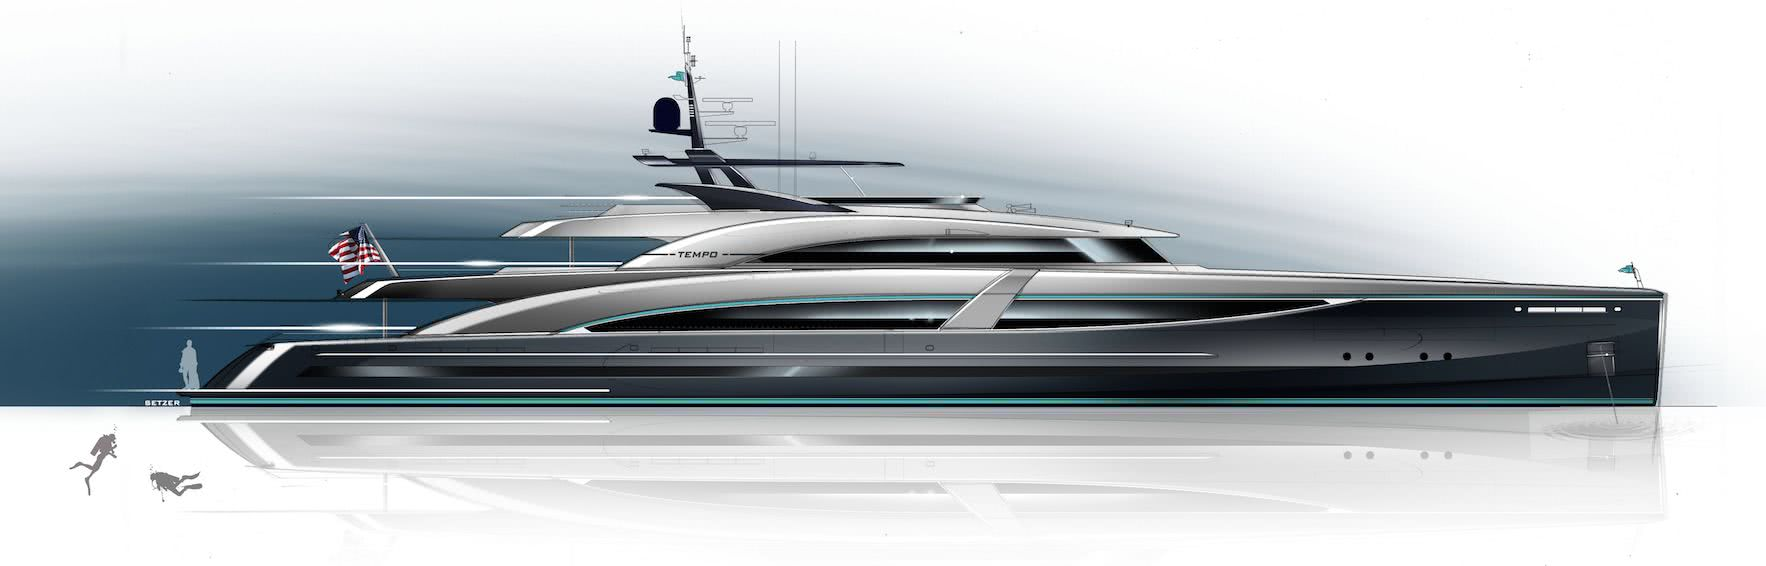 Tempo Yacht DLBA Naval Architects